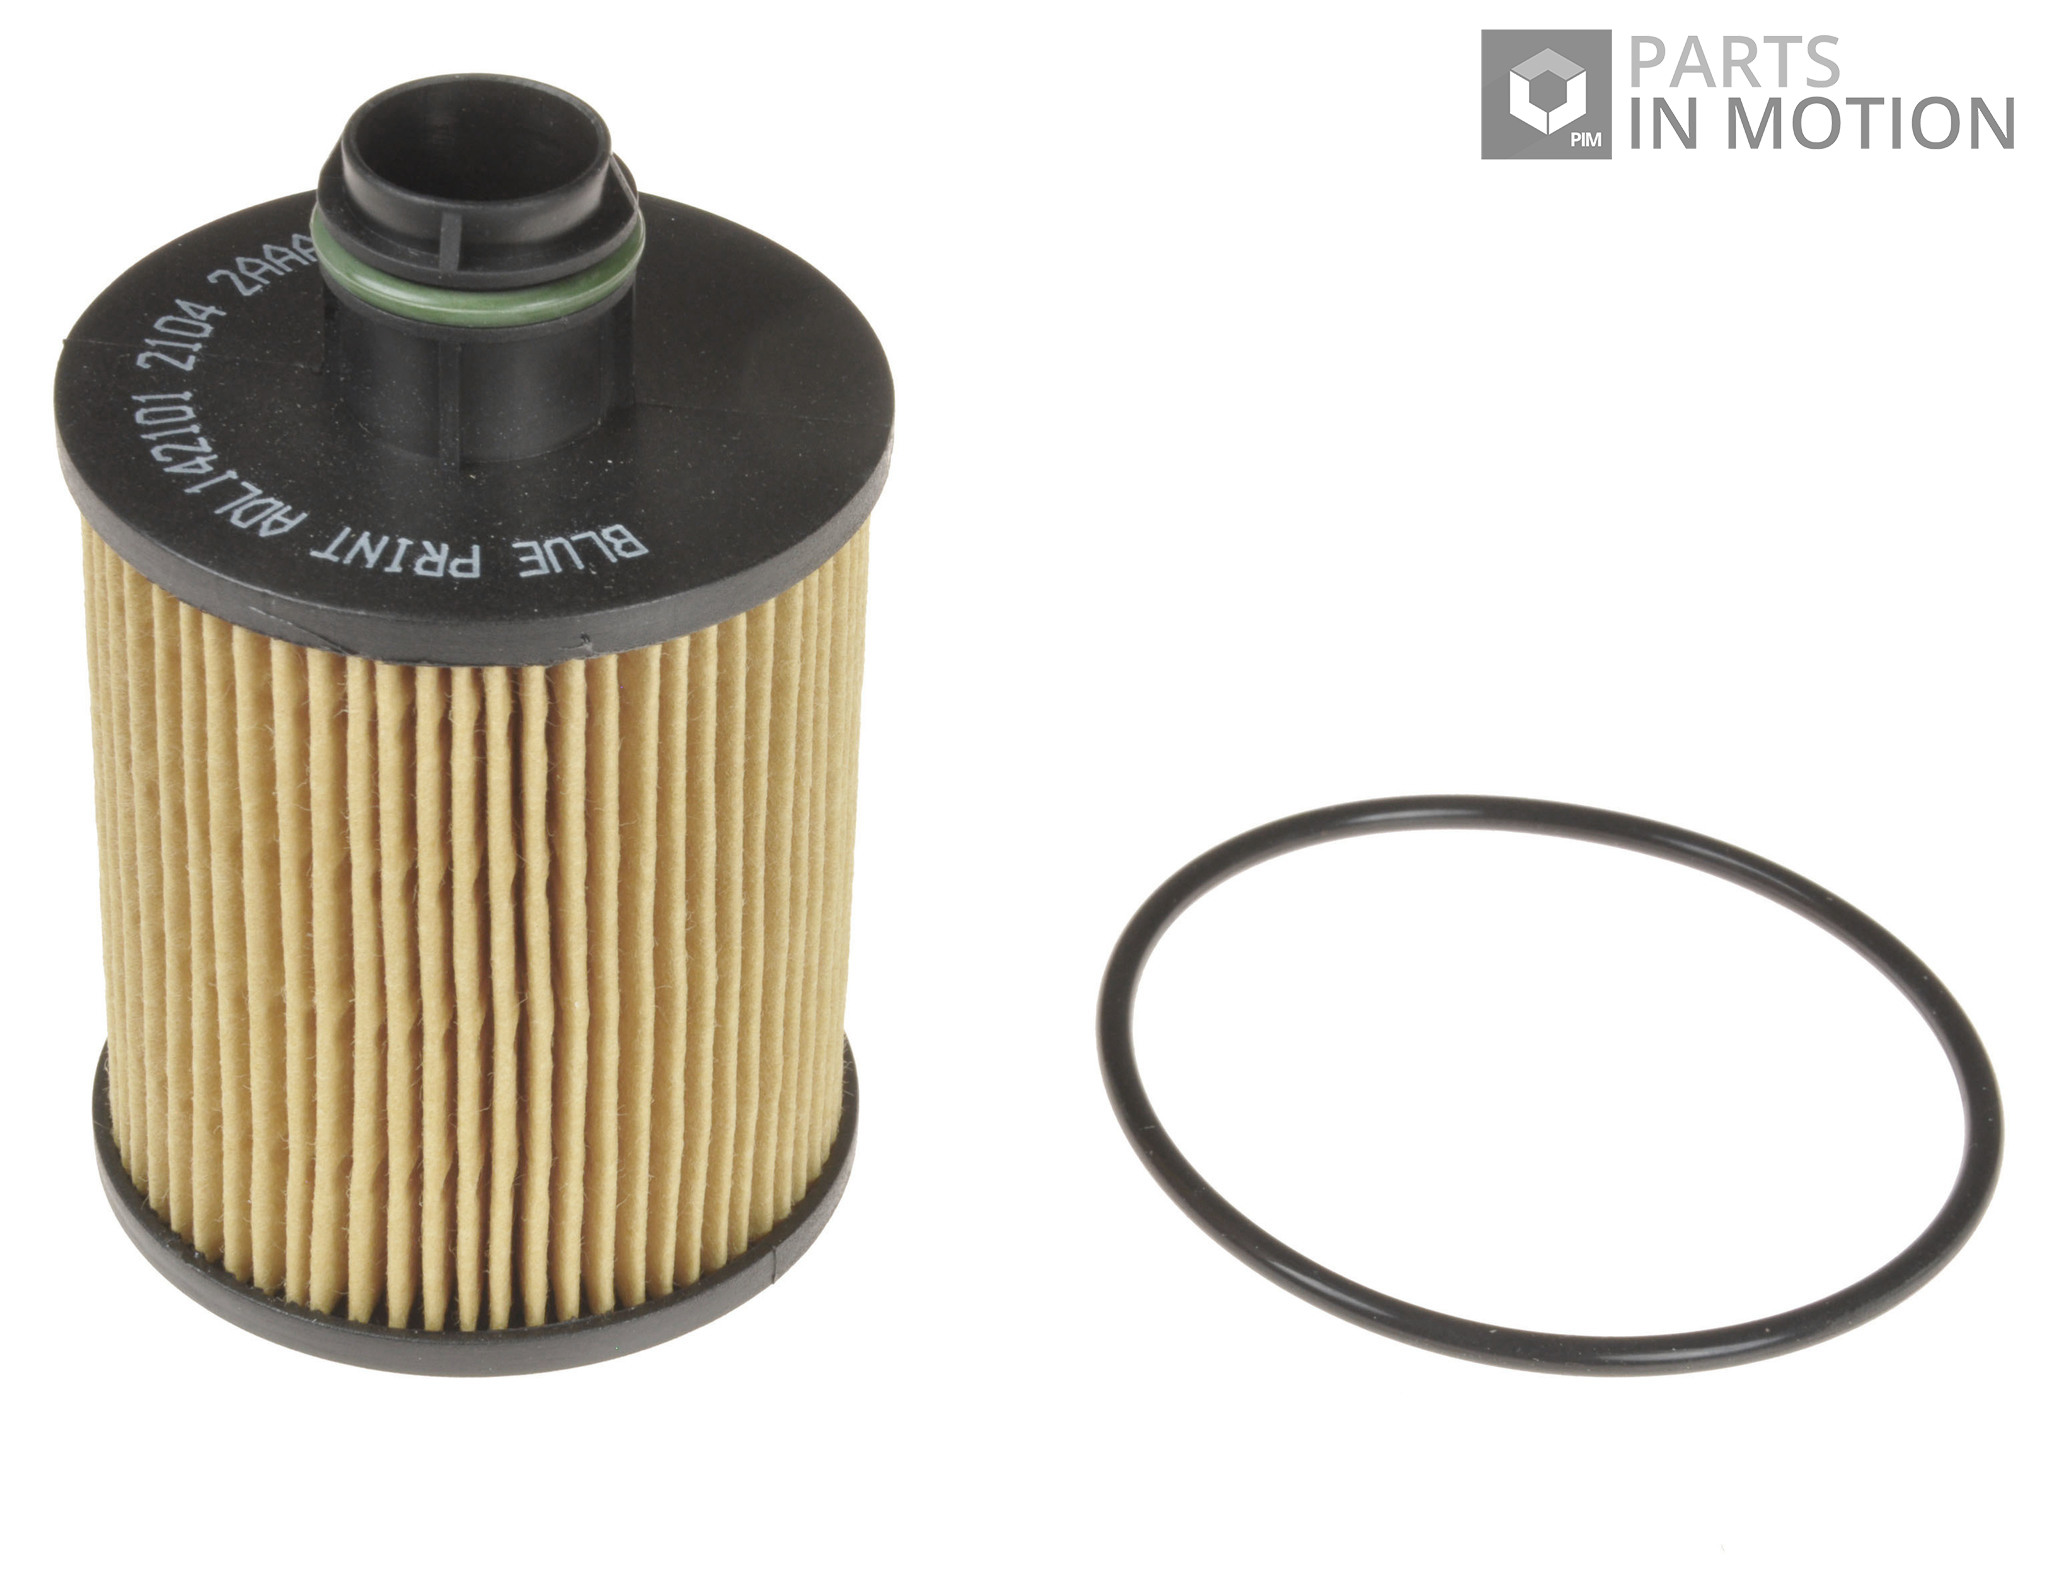 Fits Fiat Qubo 1.3 D Multijet Genuine Borg /& Beck Insert Engine Oil Filter